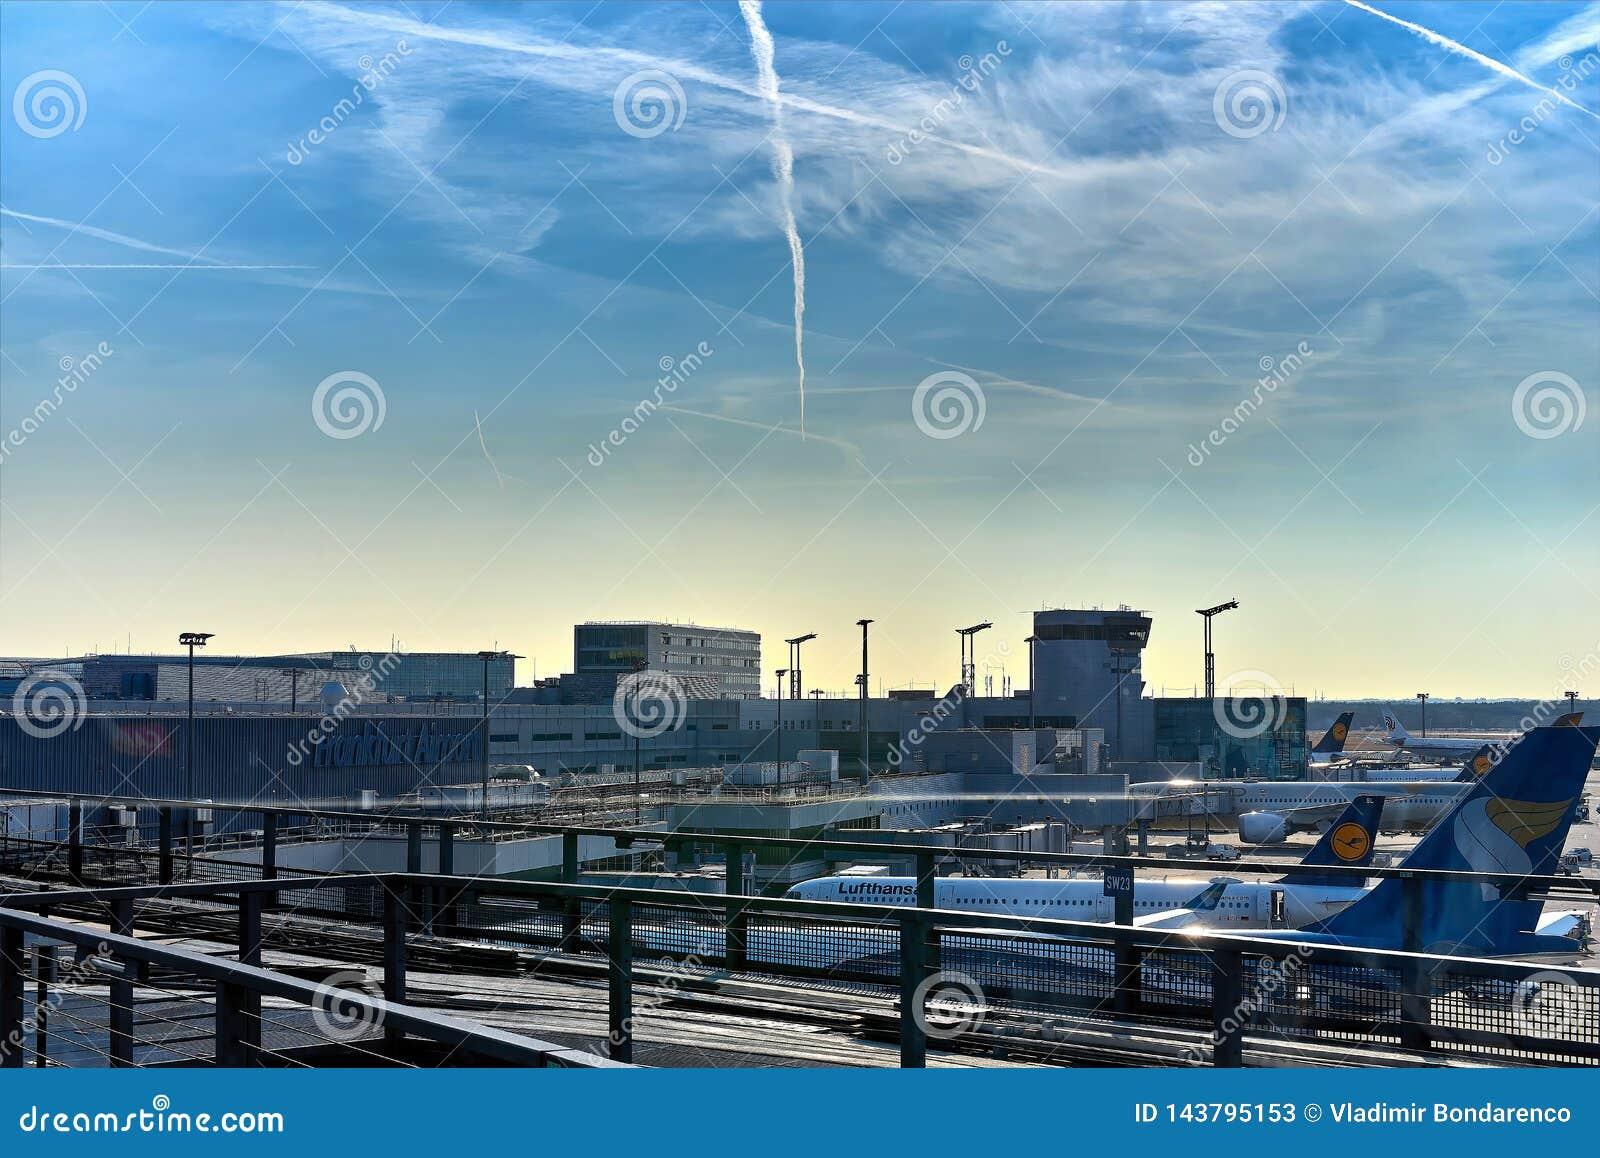 FRANKFURT, GERMANY - August 29, 2018: Skyline Train For